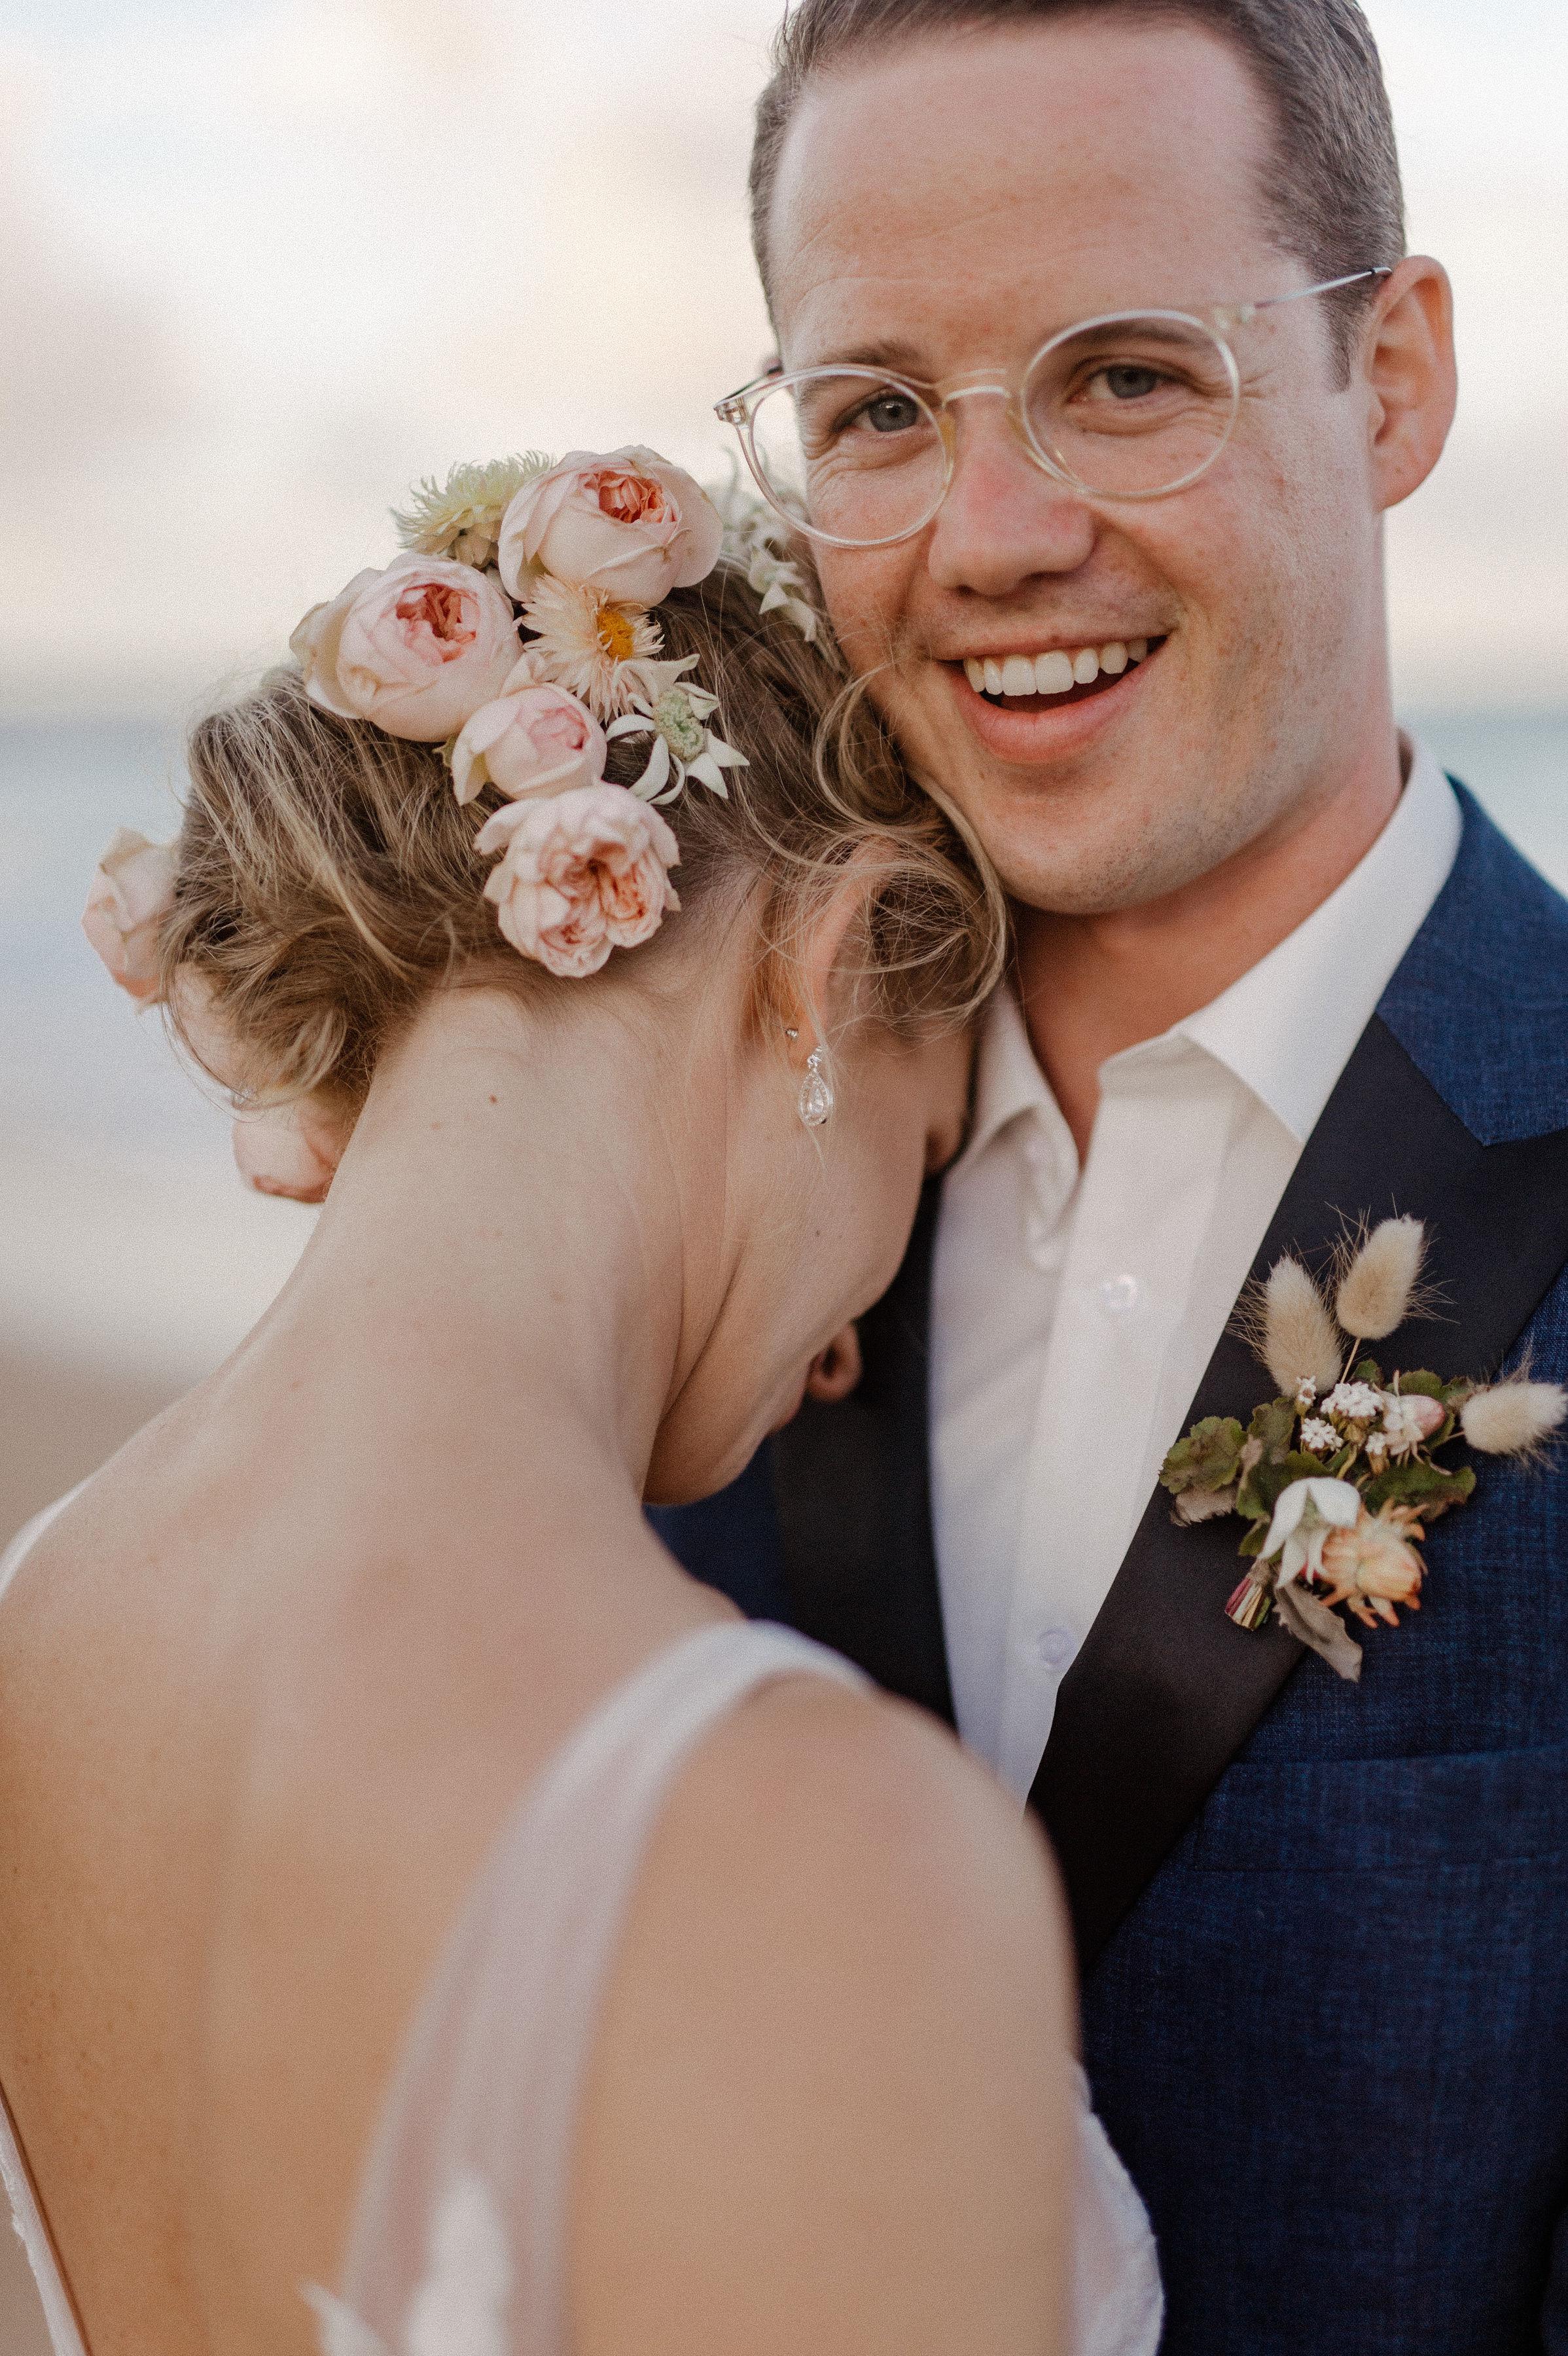 Romantic australian beach wedding. Textural and natural wedding flowers